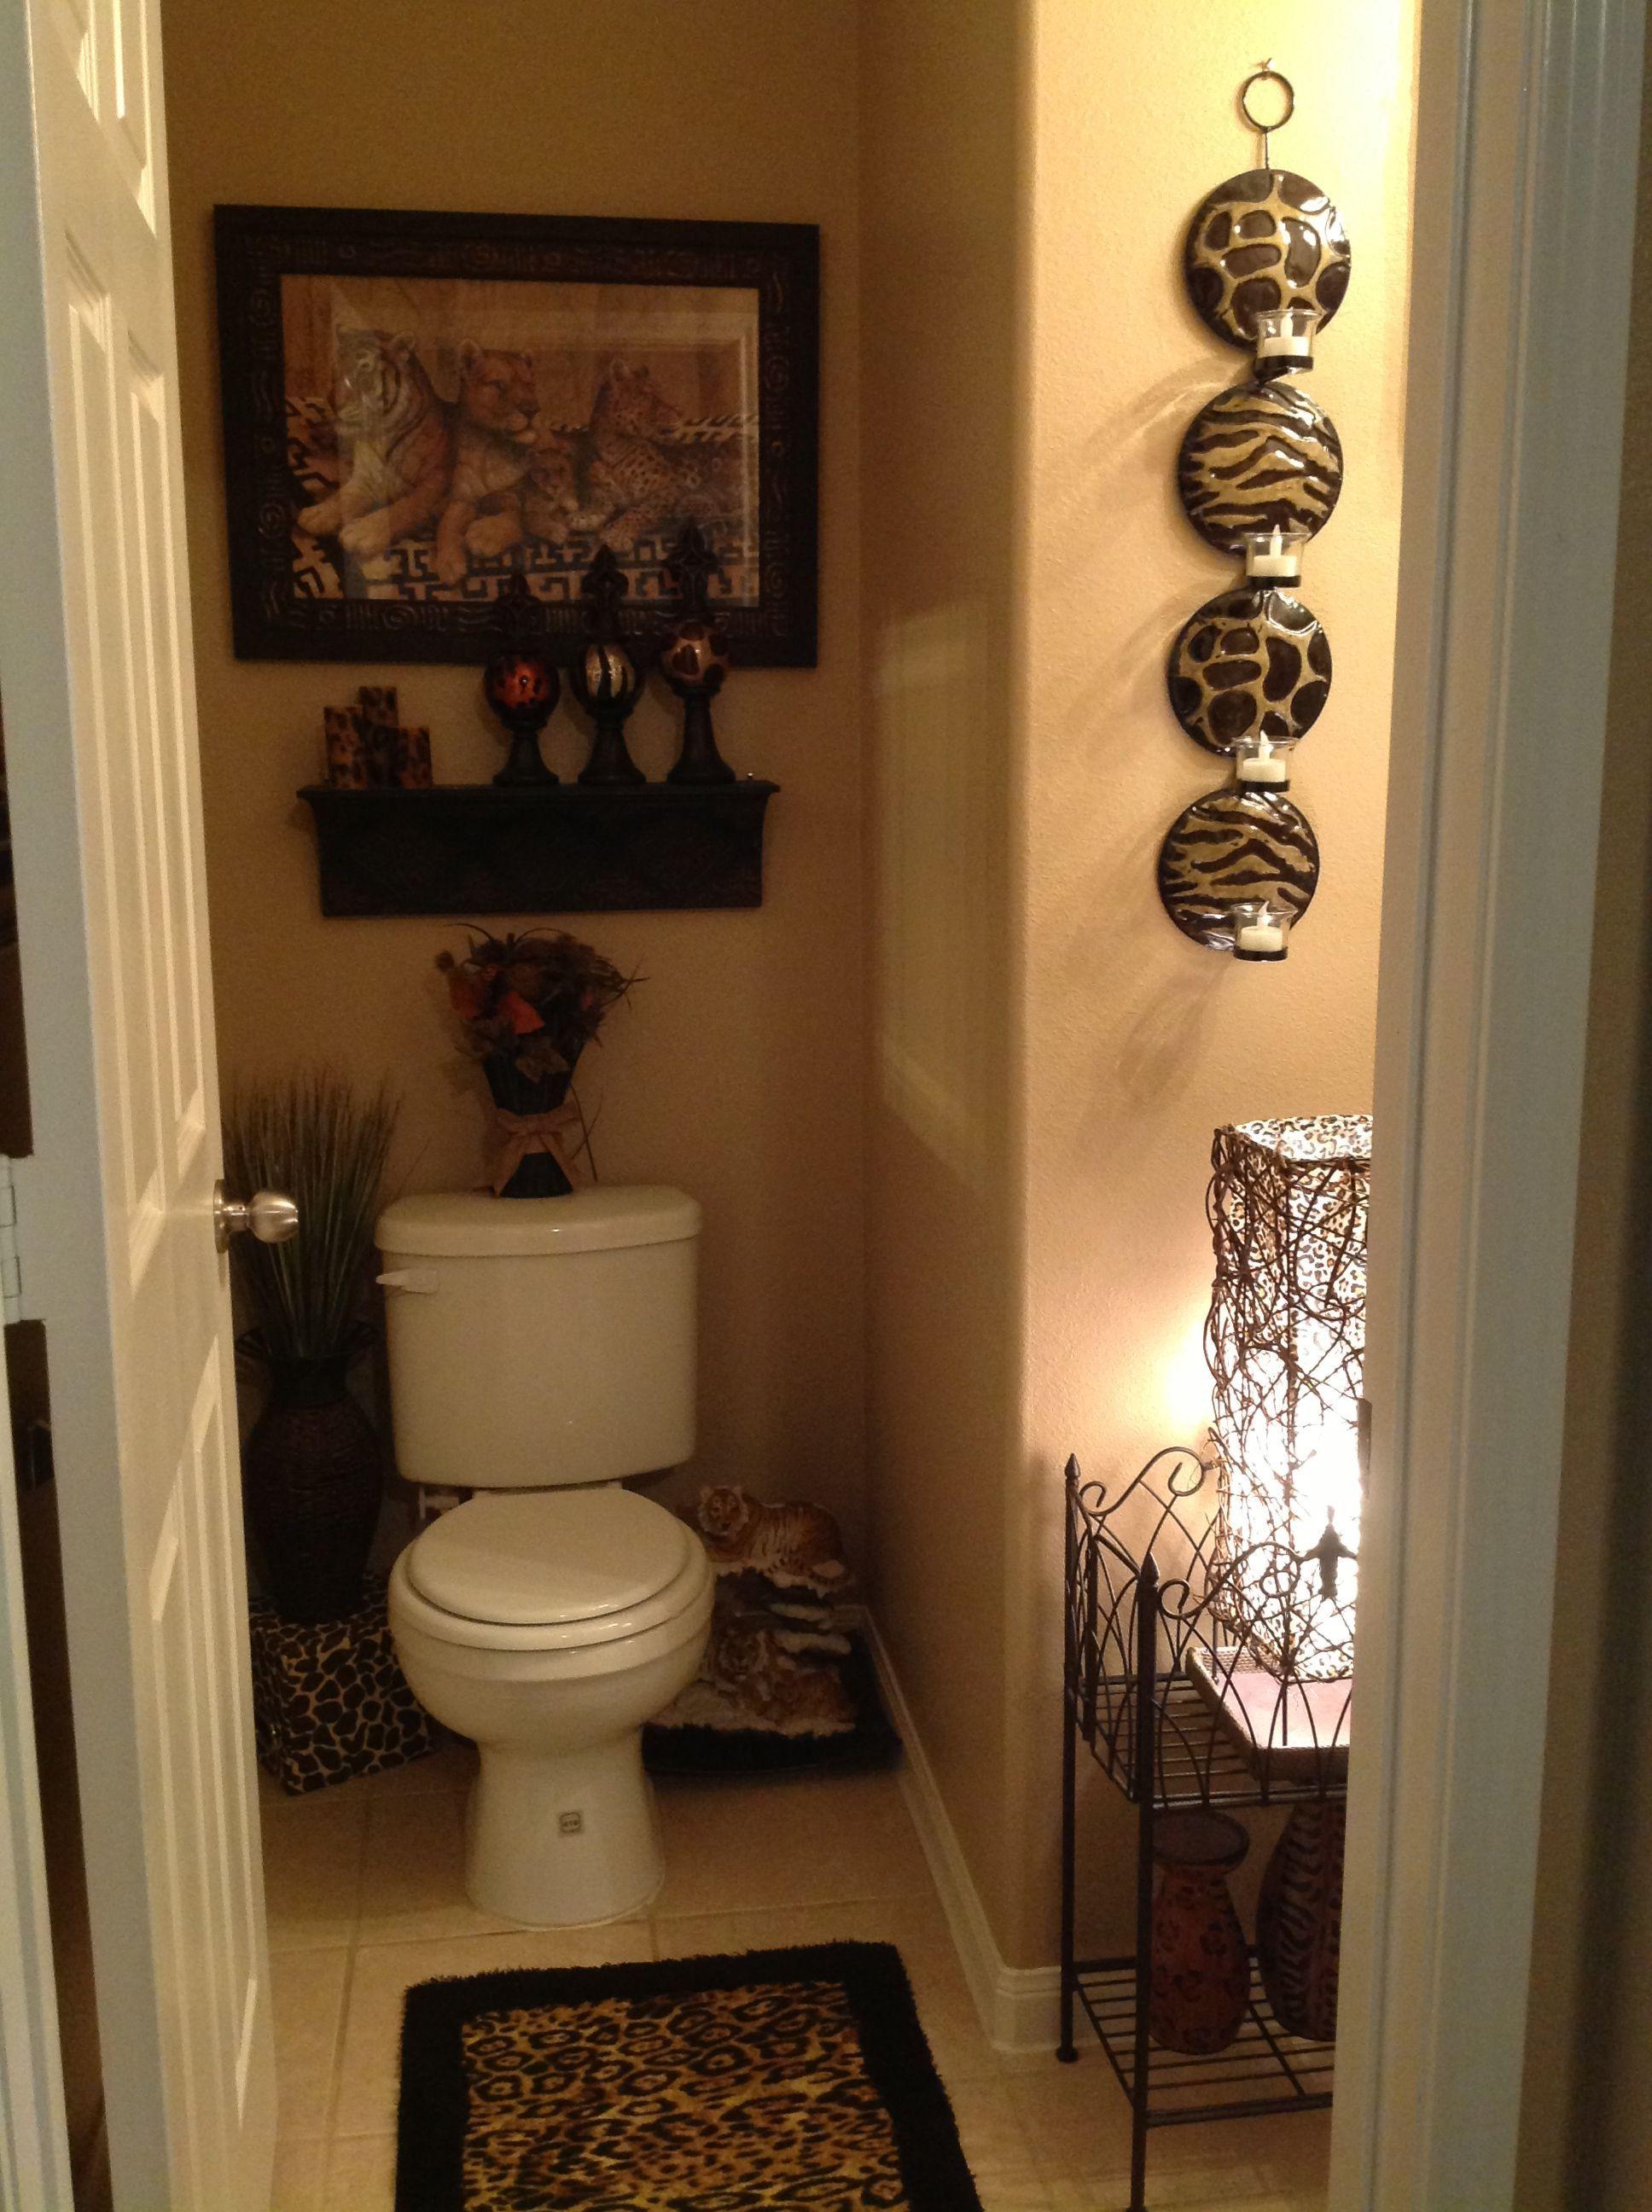 Safari Bathroom for guest bathroom. Brings a cozy, relaxing